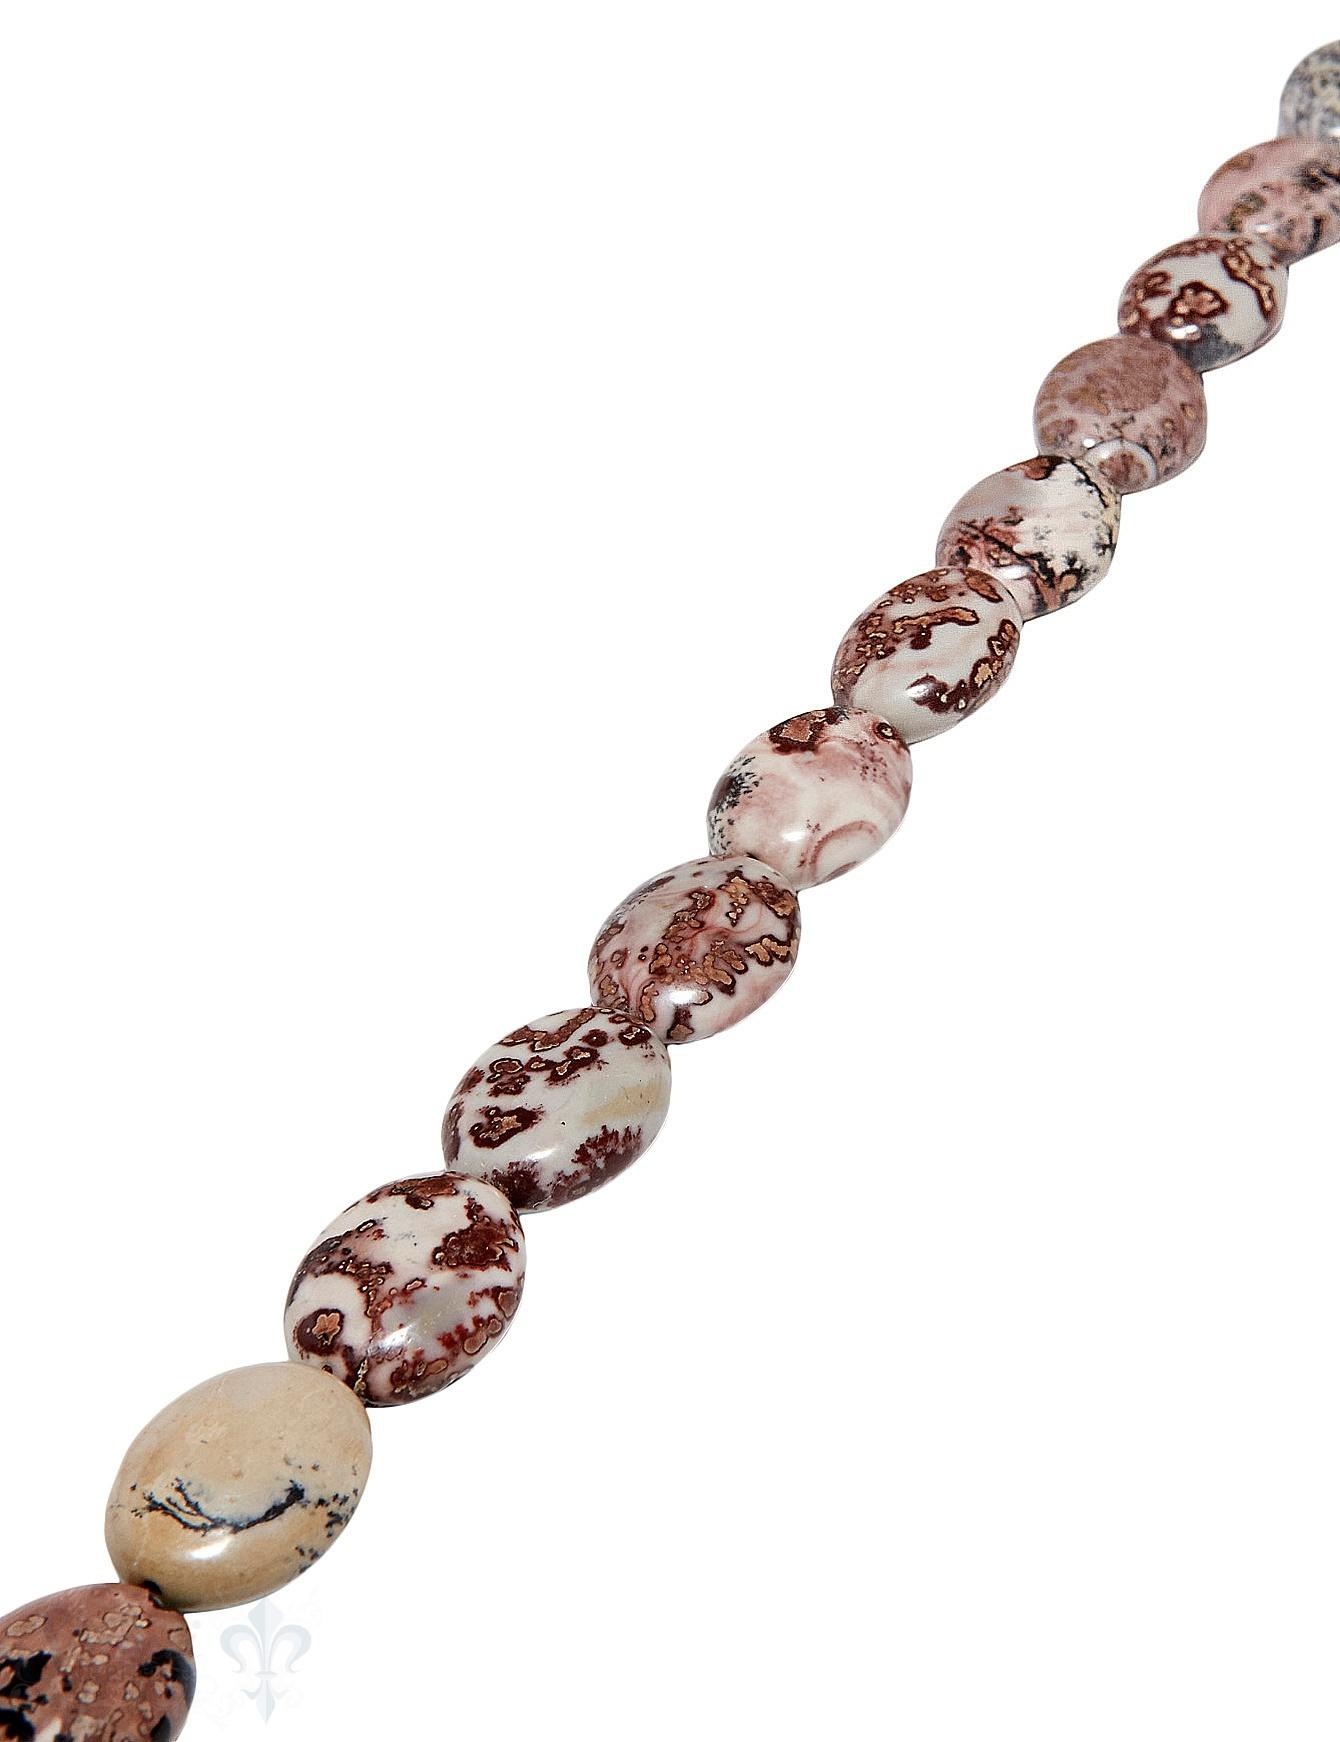 Jaspis Strang rosa/grau gefleckt 20x16 mm oval pol